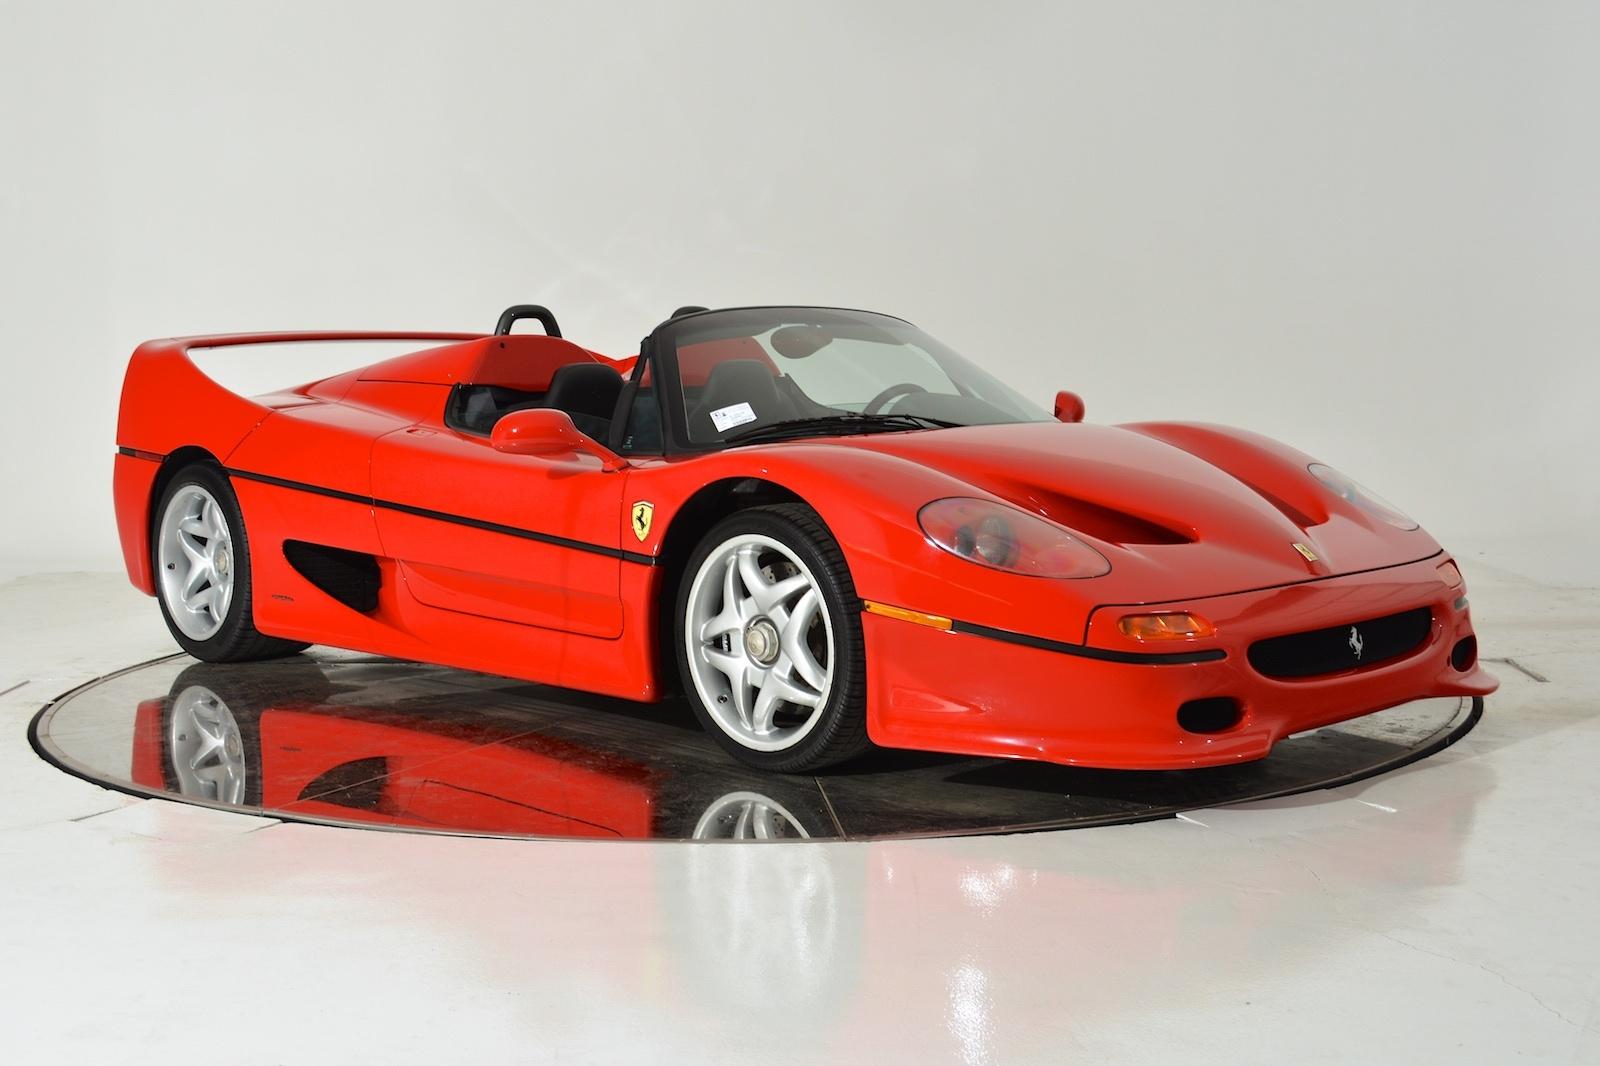 Ferrari fans dig in the rare ferrari f50 is up for sale for 26 the rare ferrari f50 is up for sale for 26 million vanachro Choice Image